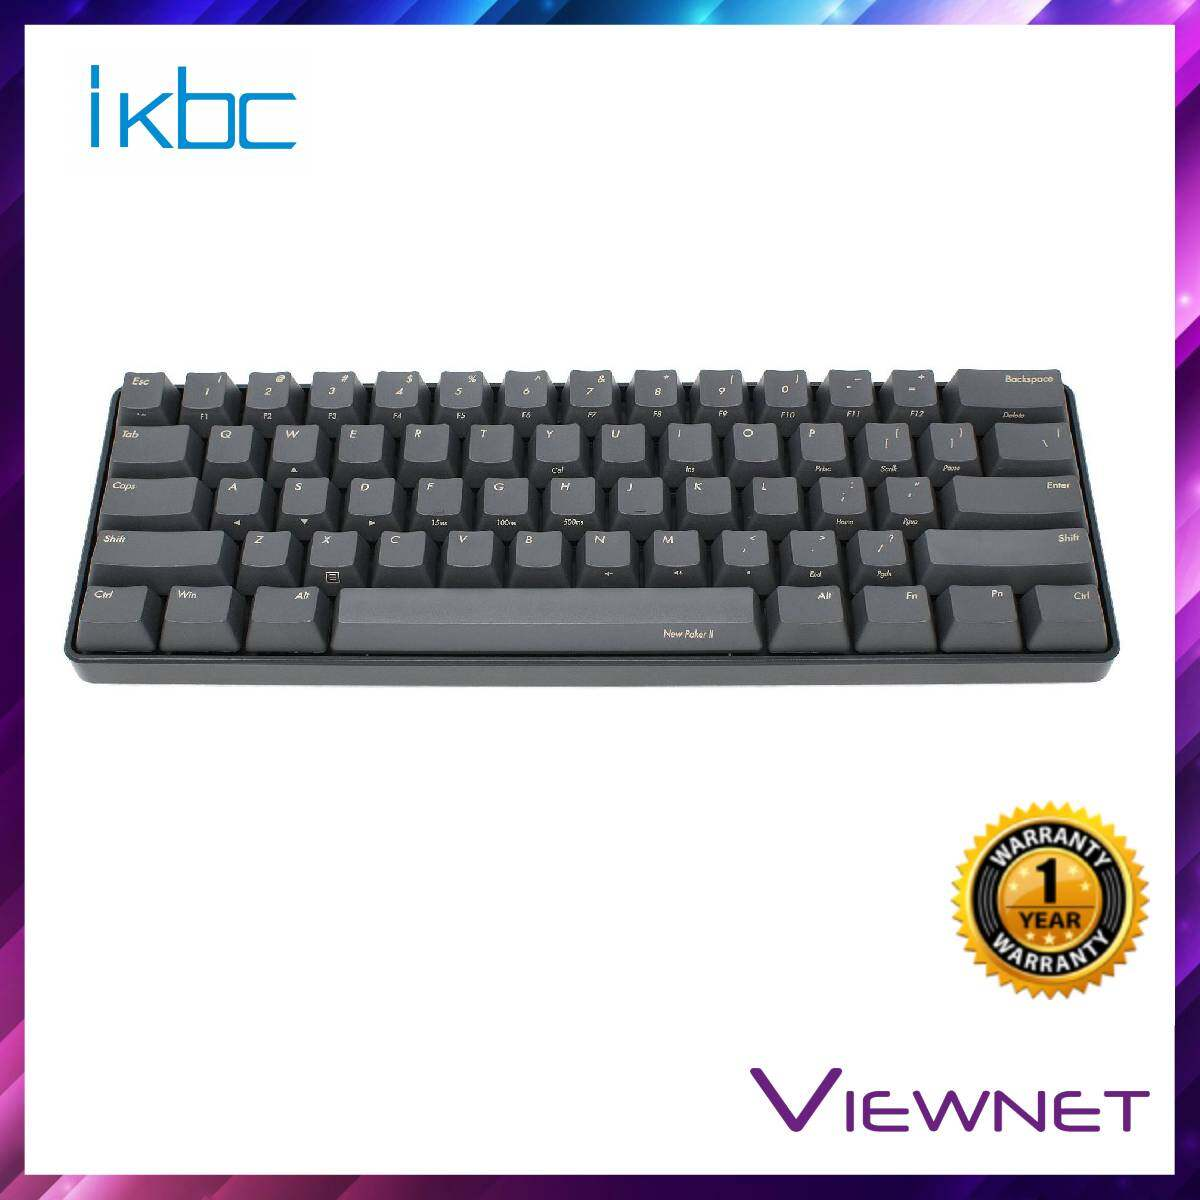 IKBC Gaming Wired New Poker II (Blue/Brown/Red Switch) Black Keyboard